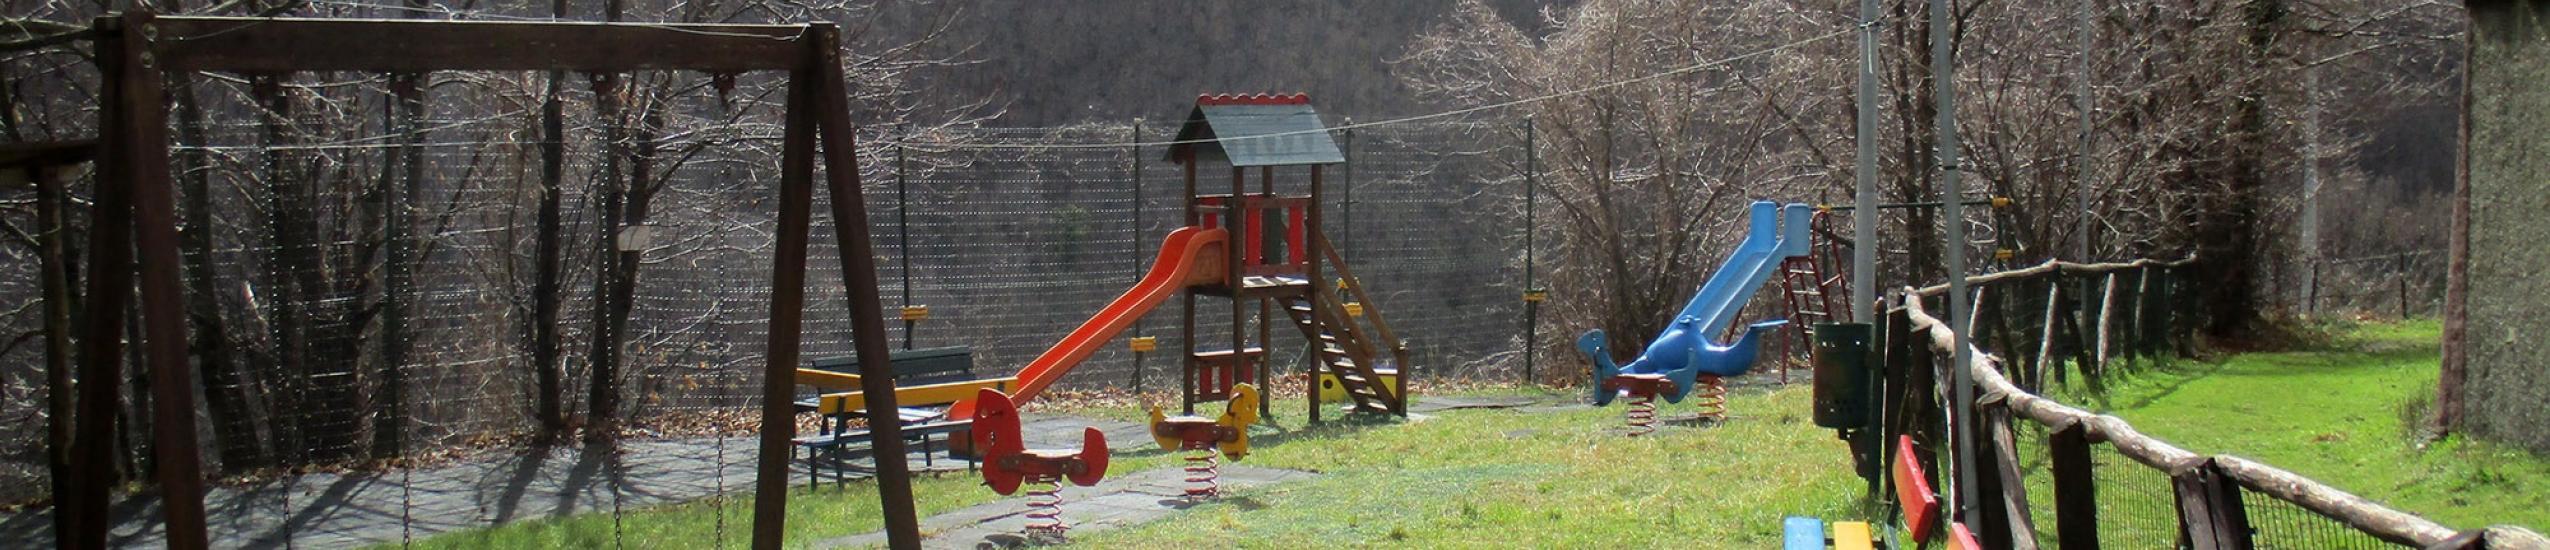 "parco giochi ""Stataland"" (0)"